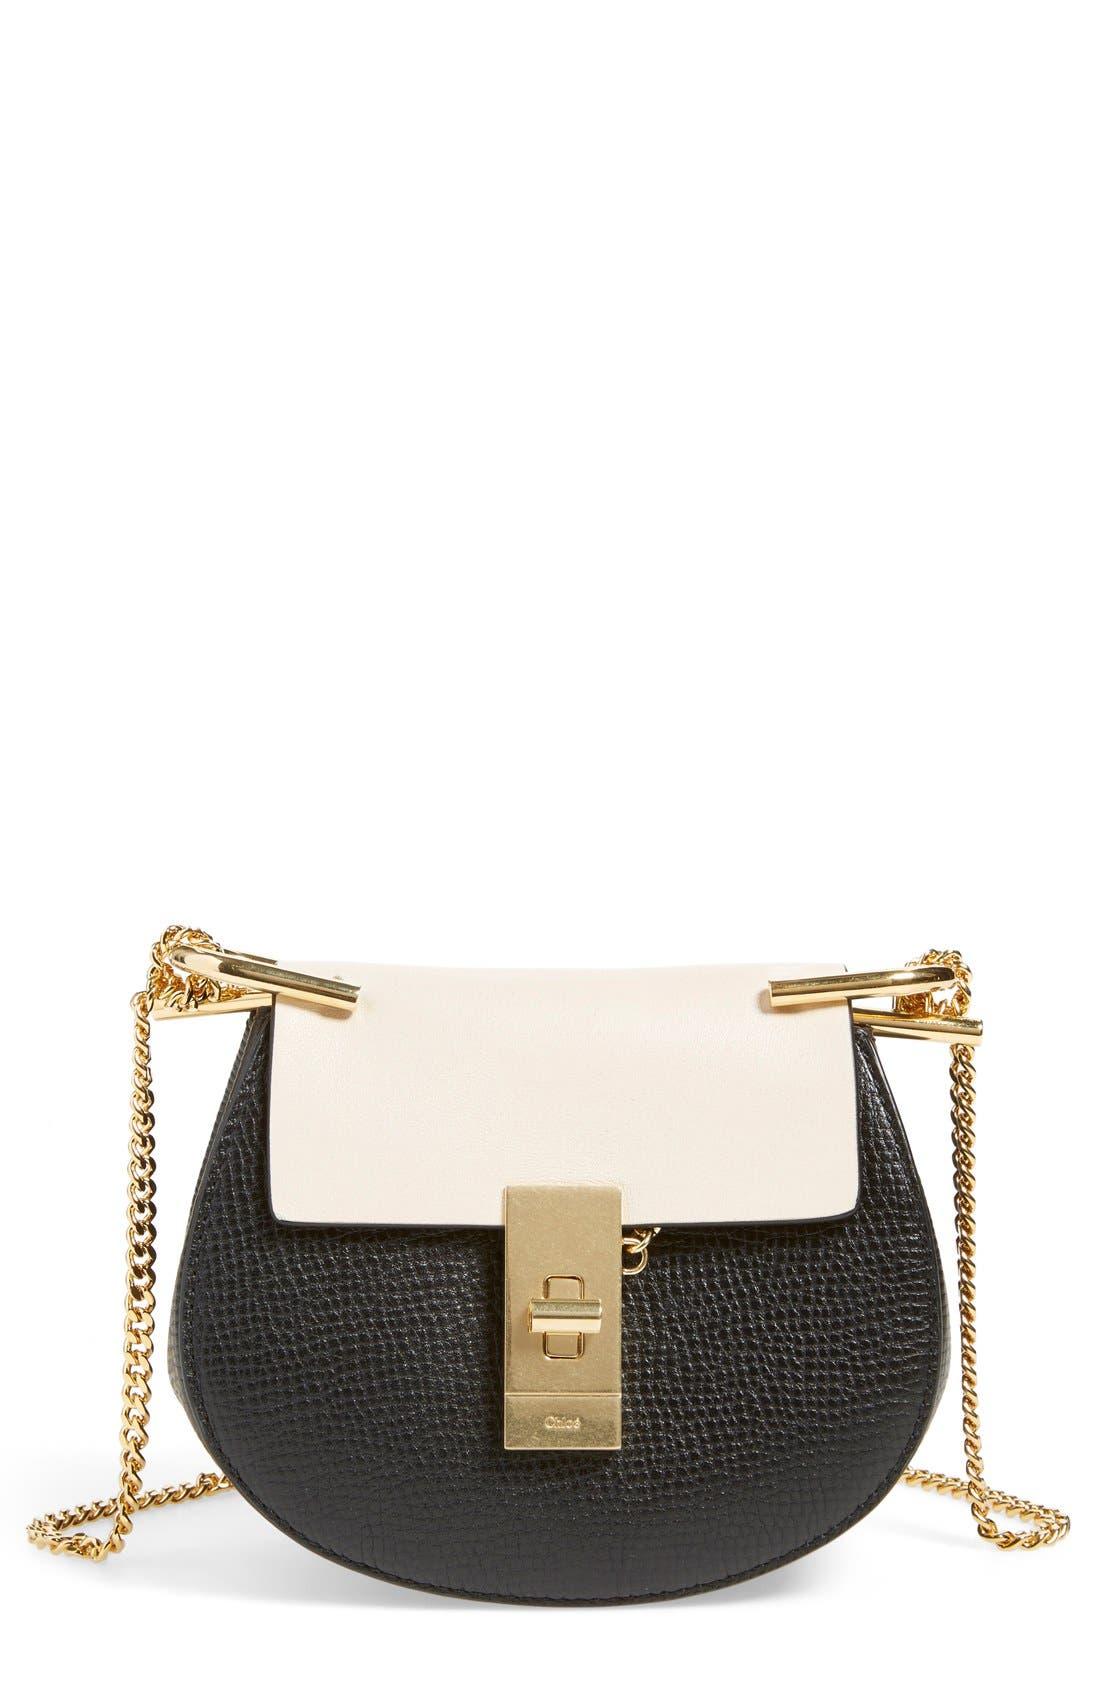 Main Image - Chloé 'Nano Drew' Lambskin & Calfskin Leather Shoulder Bag